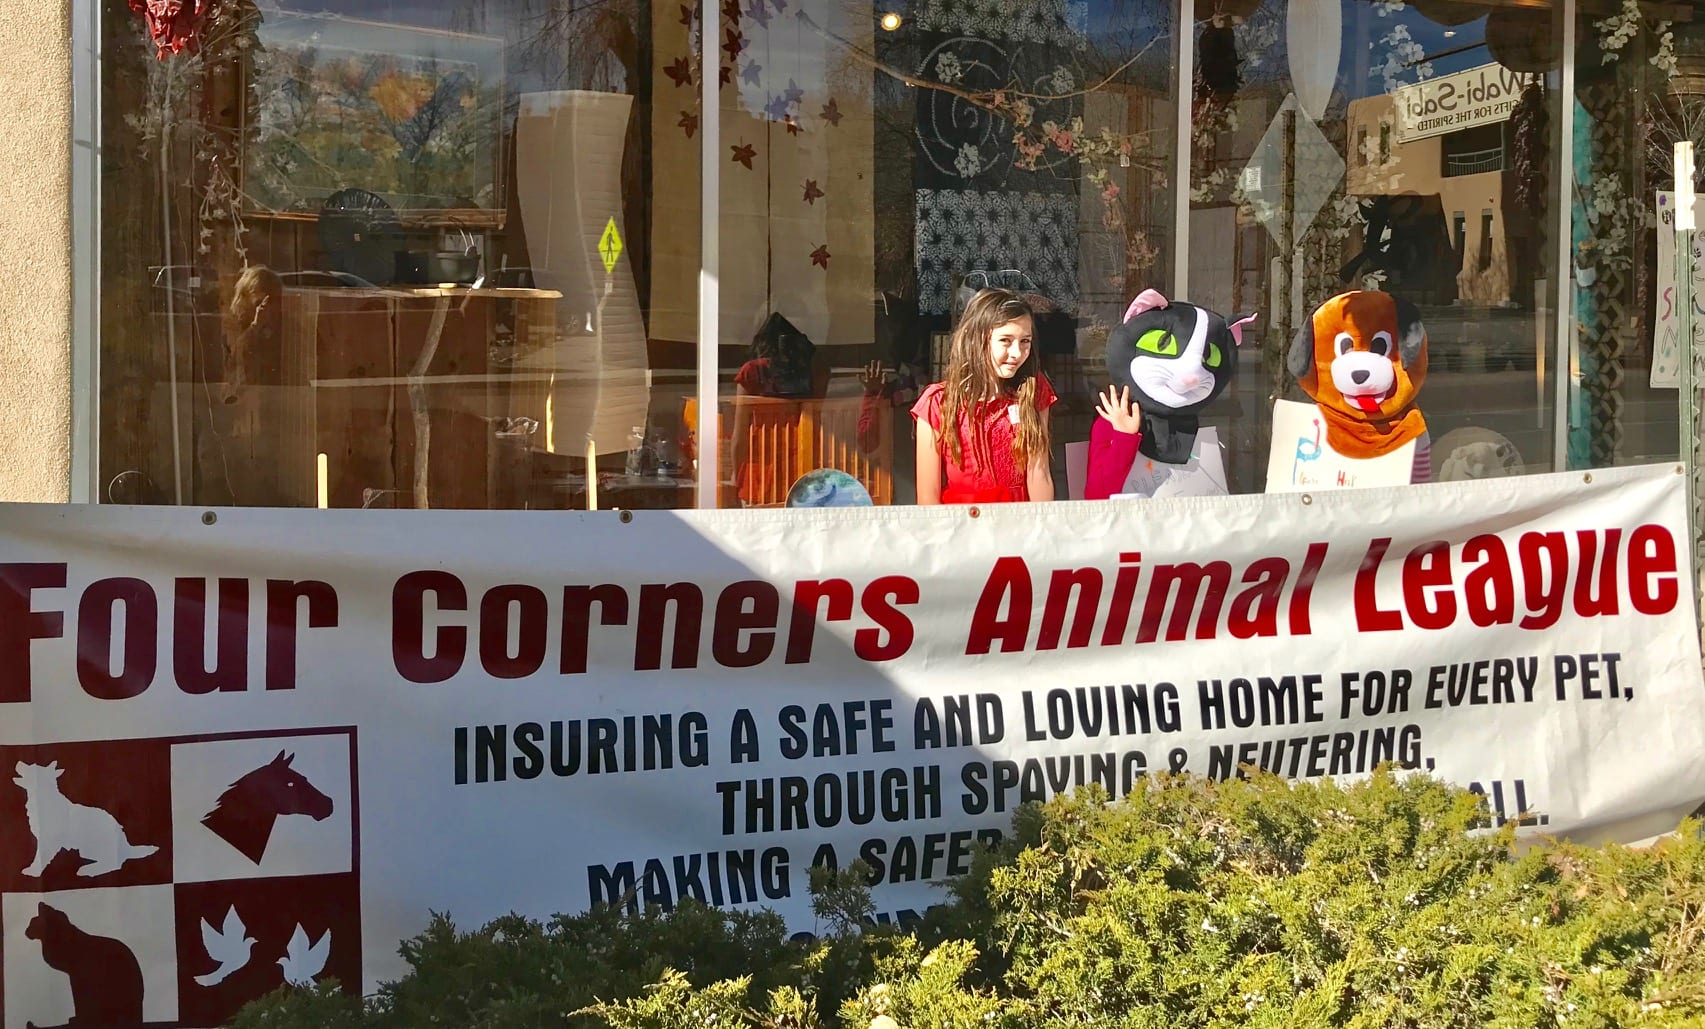 Four Corners Animal League